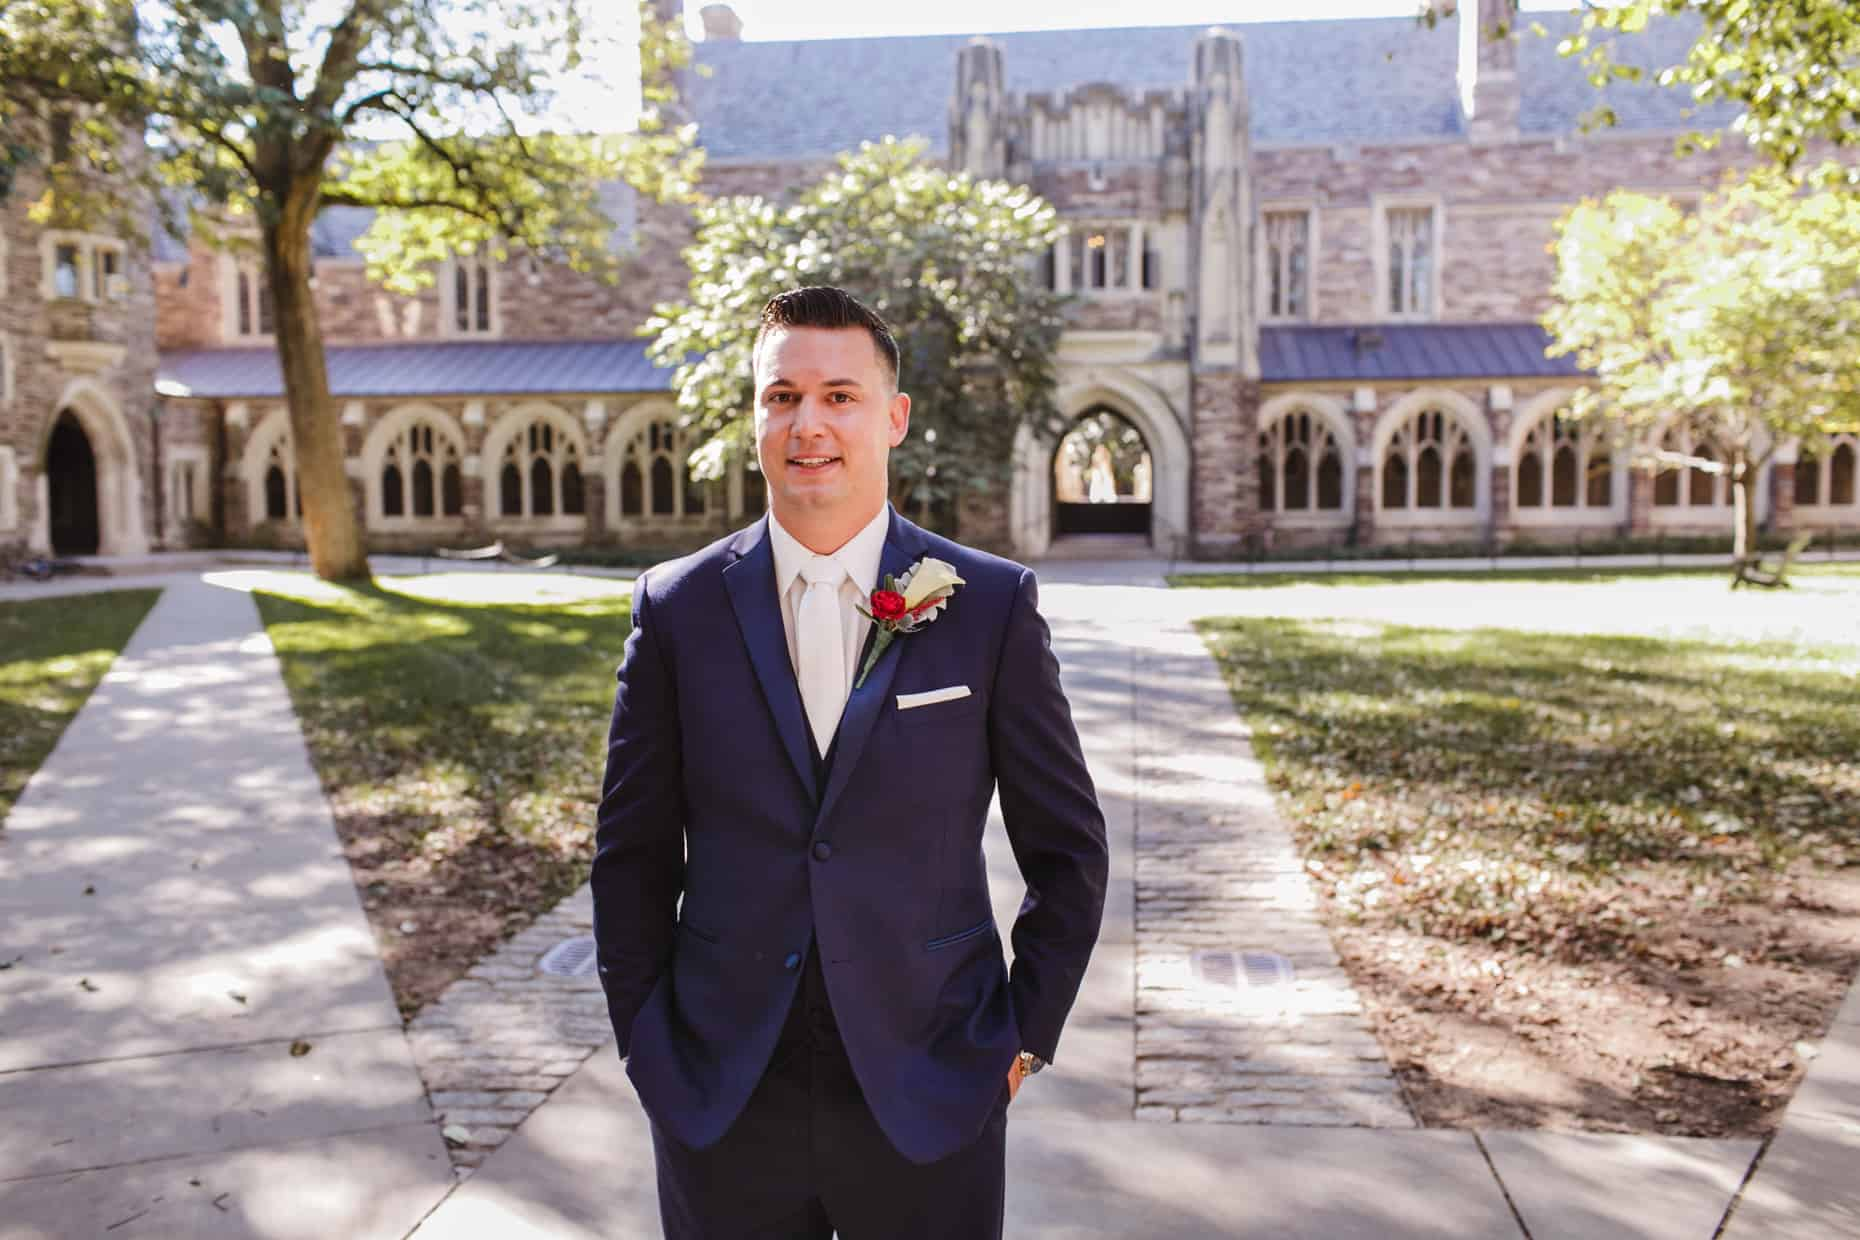 Wedding Picture Princeton